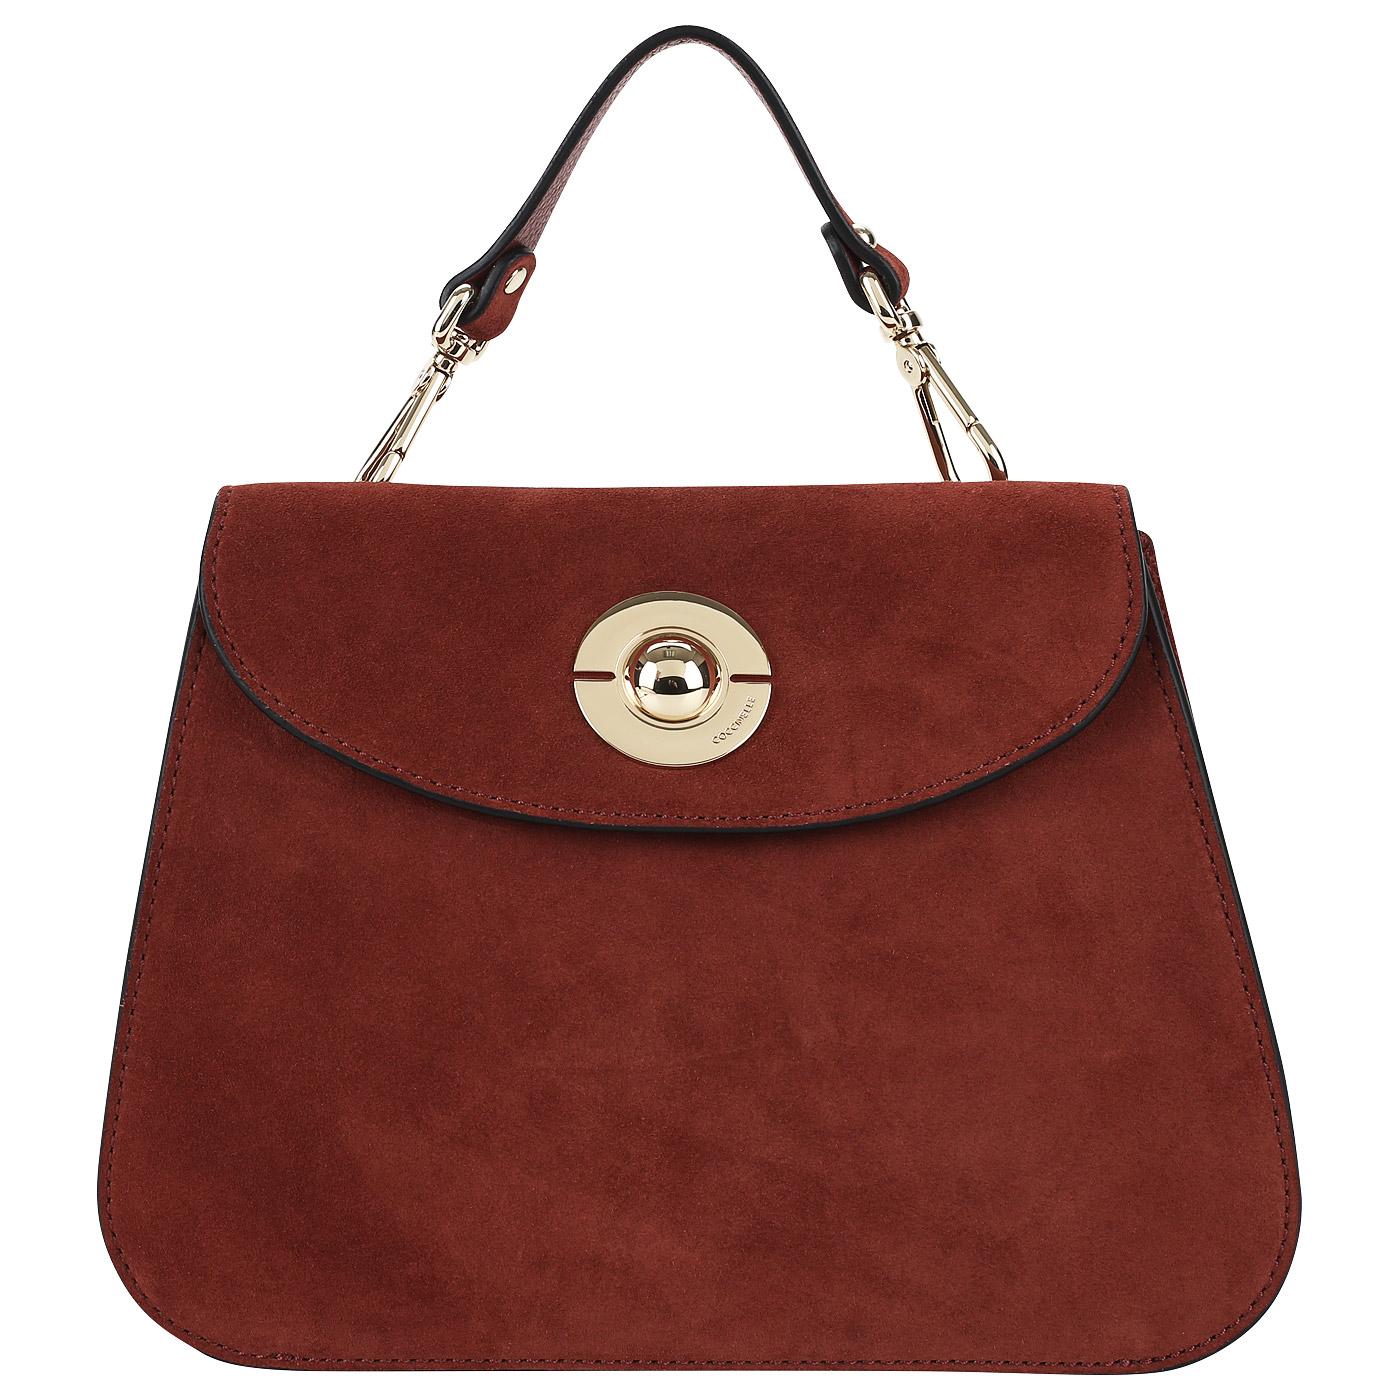 417611468277 Замшевая сумочка со съемной ручкой Coccinelle Jalouse suede CB1 55 ...